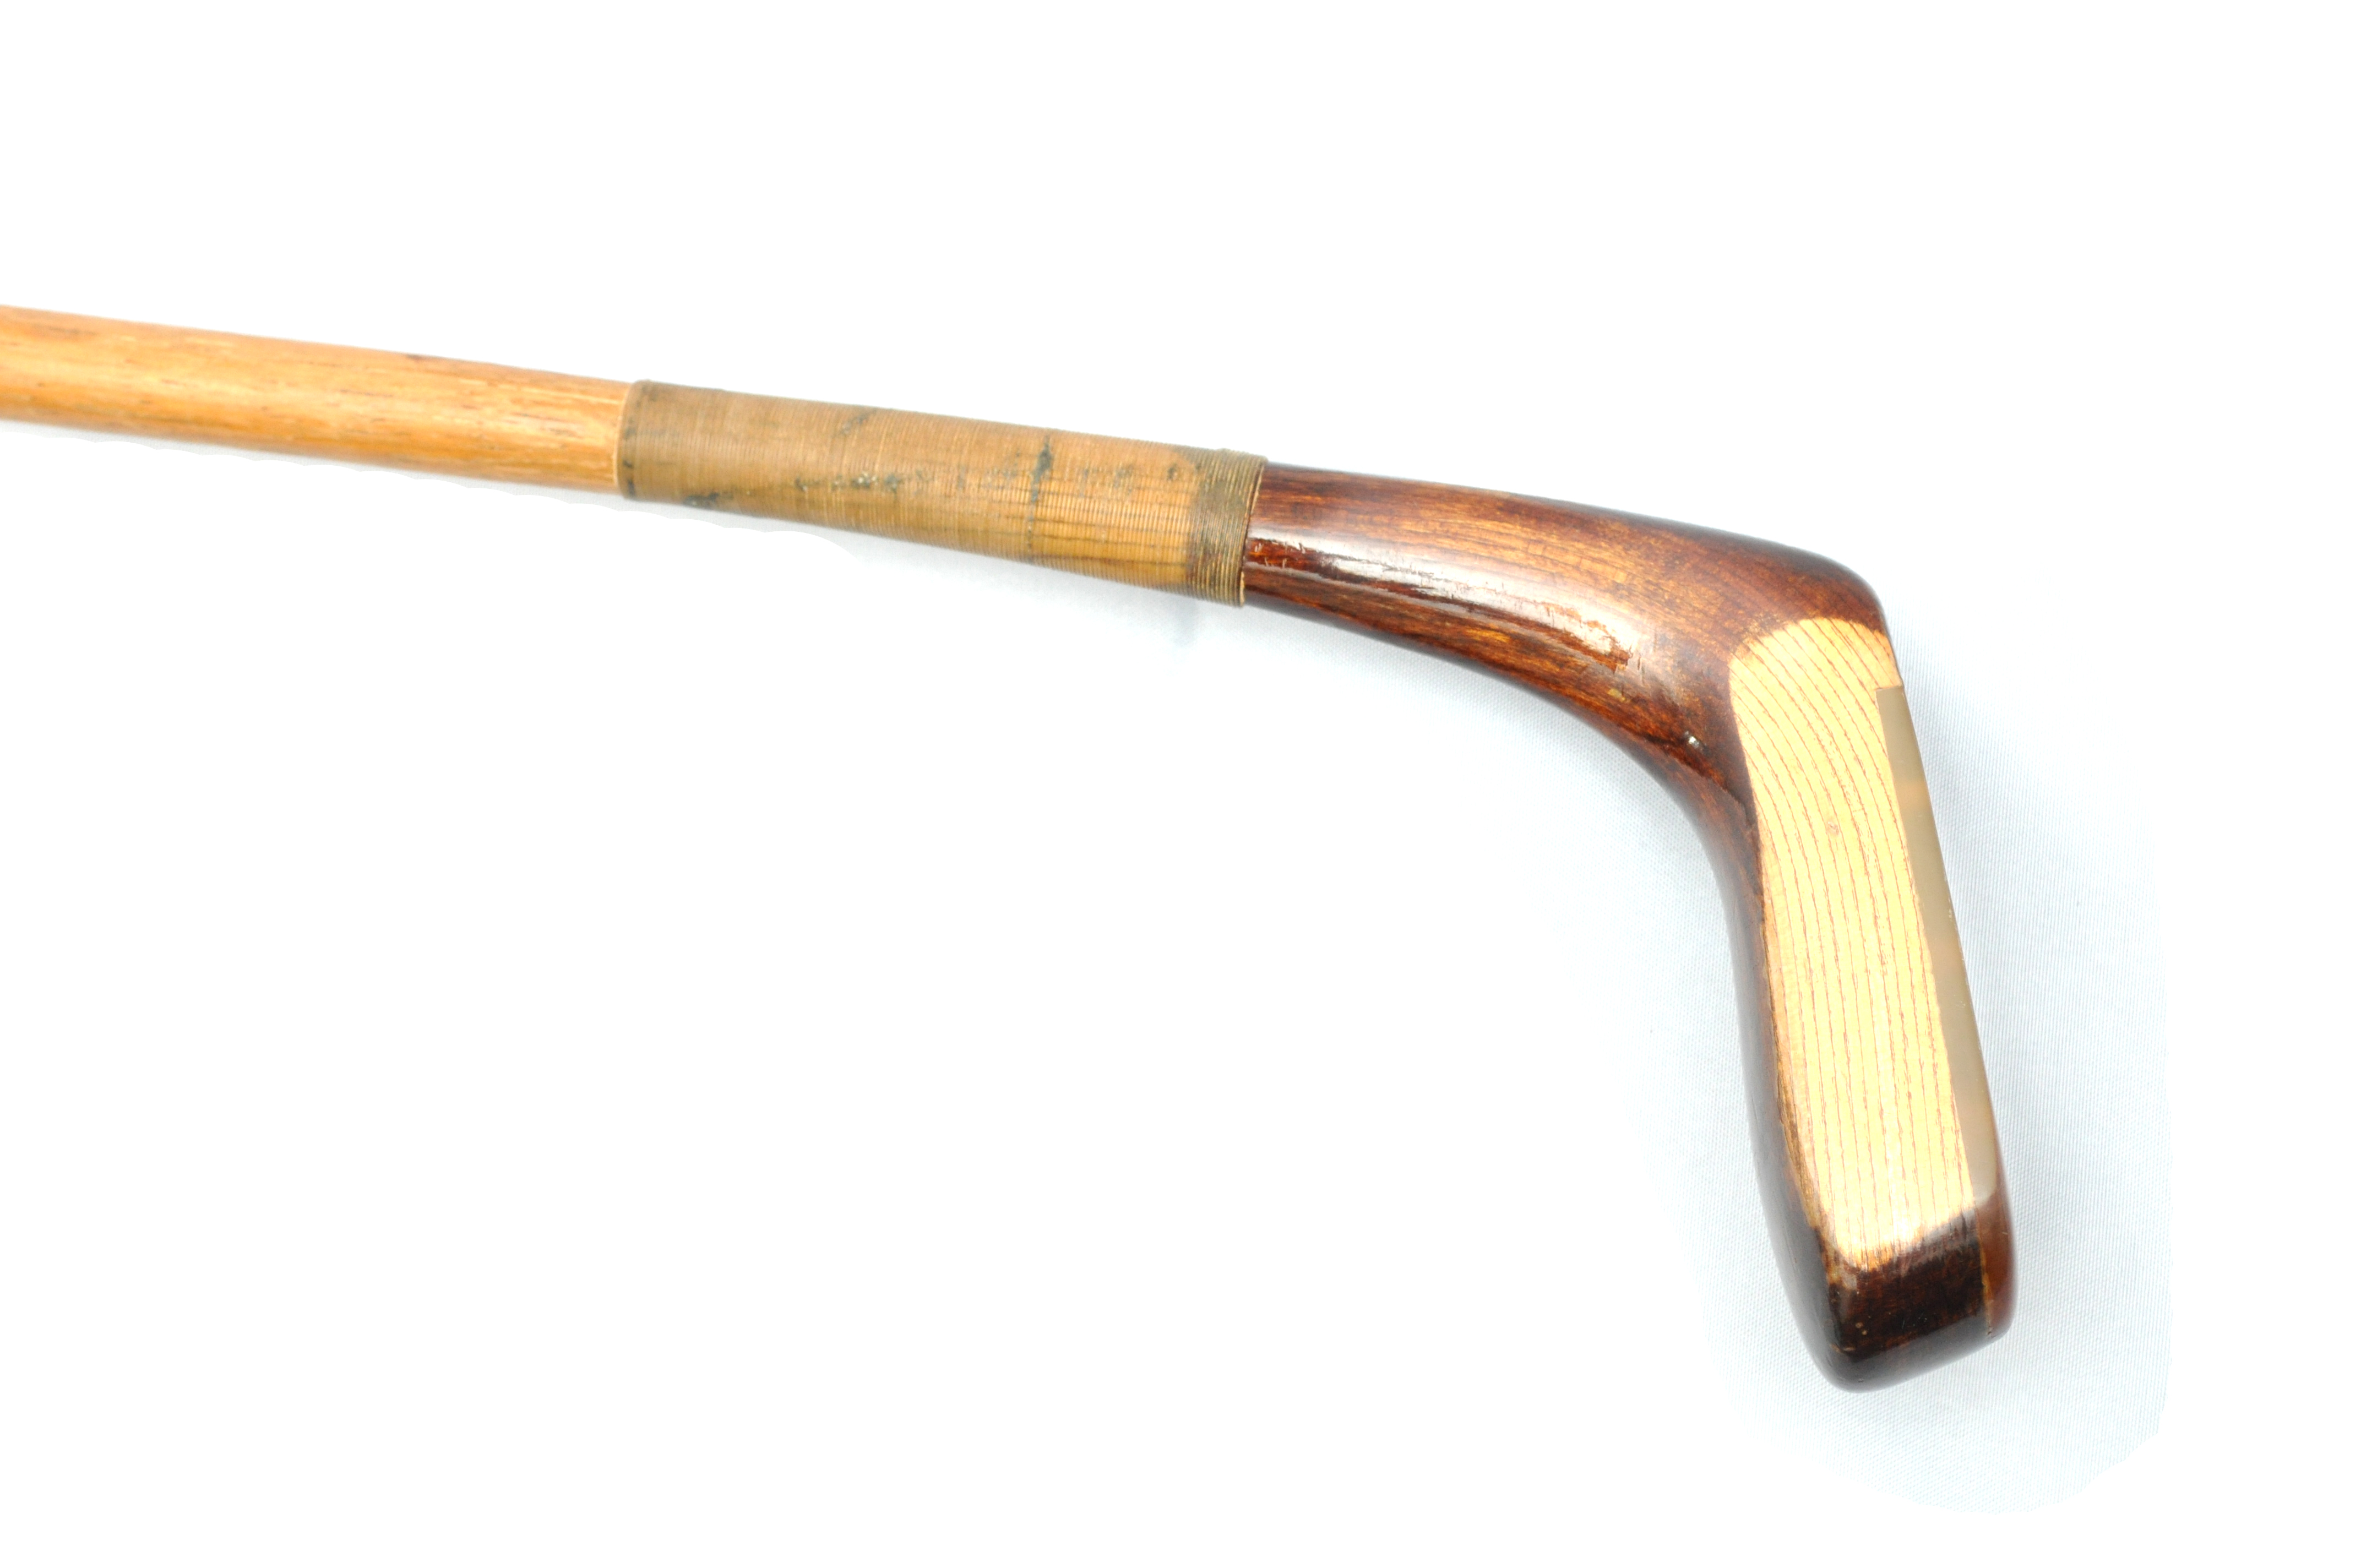 St Andrews Wooden Putter 163 385 00 467 Hickory Golf Supplies